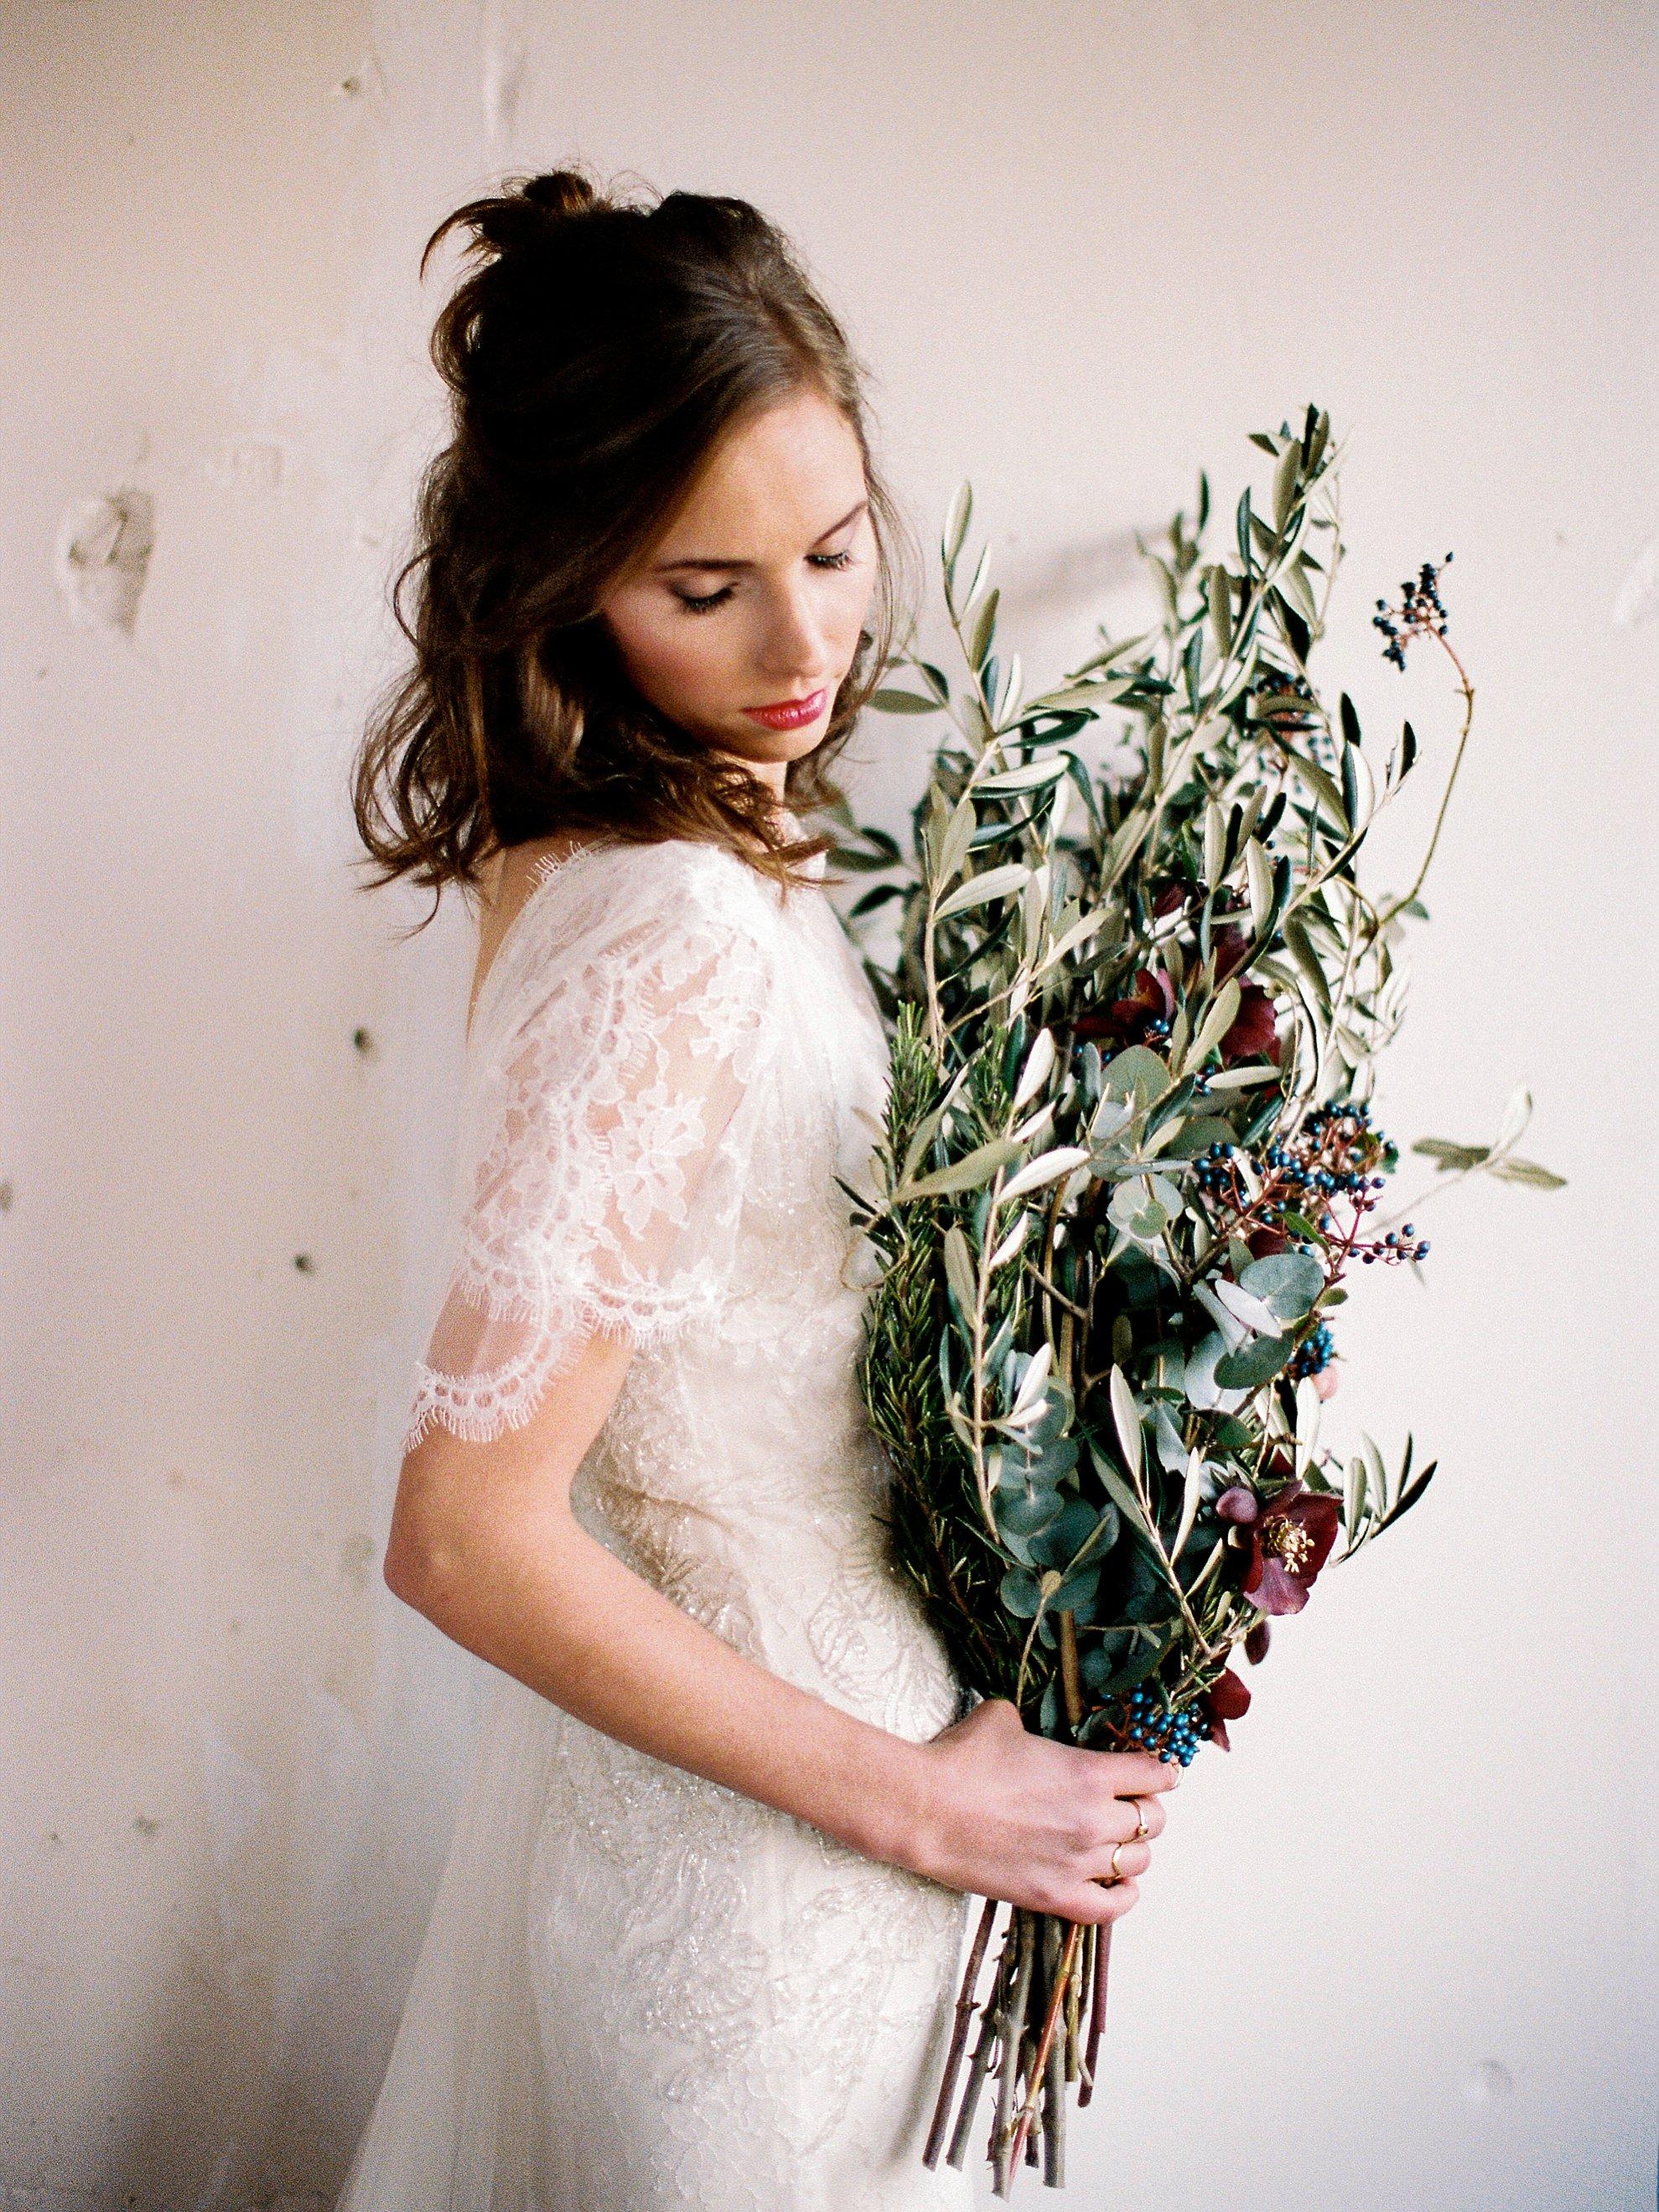 Amanda-Drost-fine-art-photography_0009.jpg